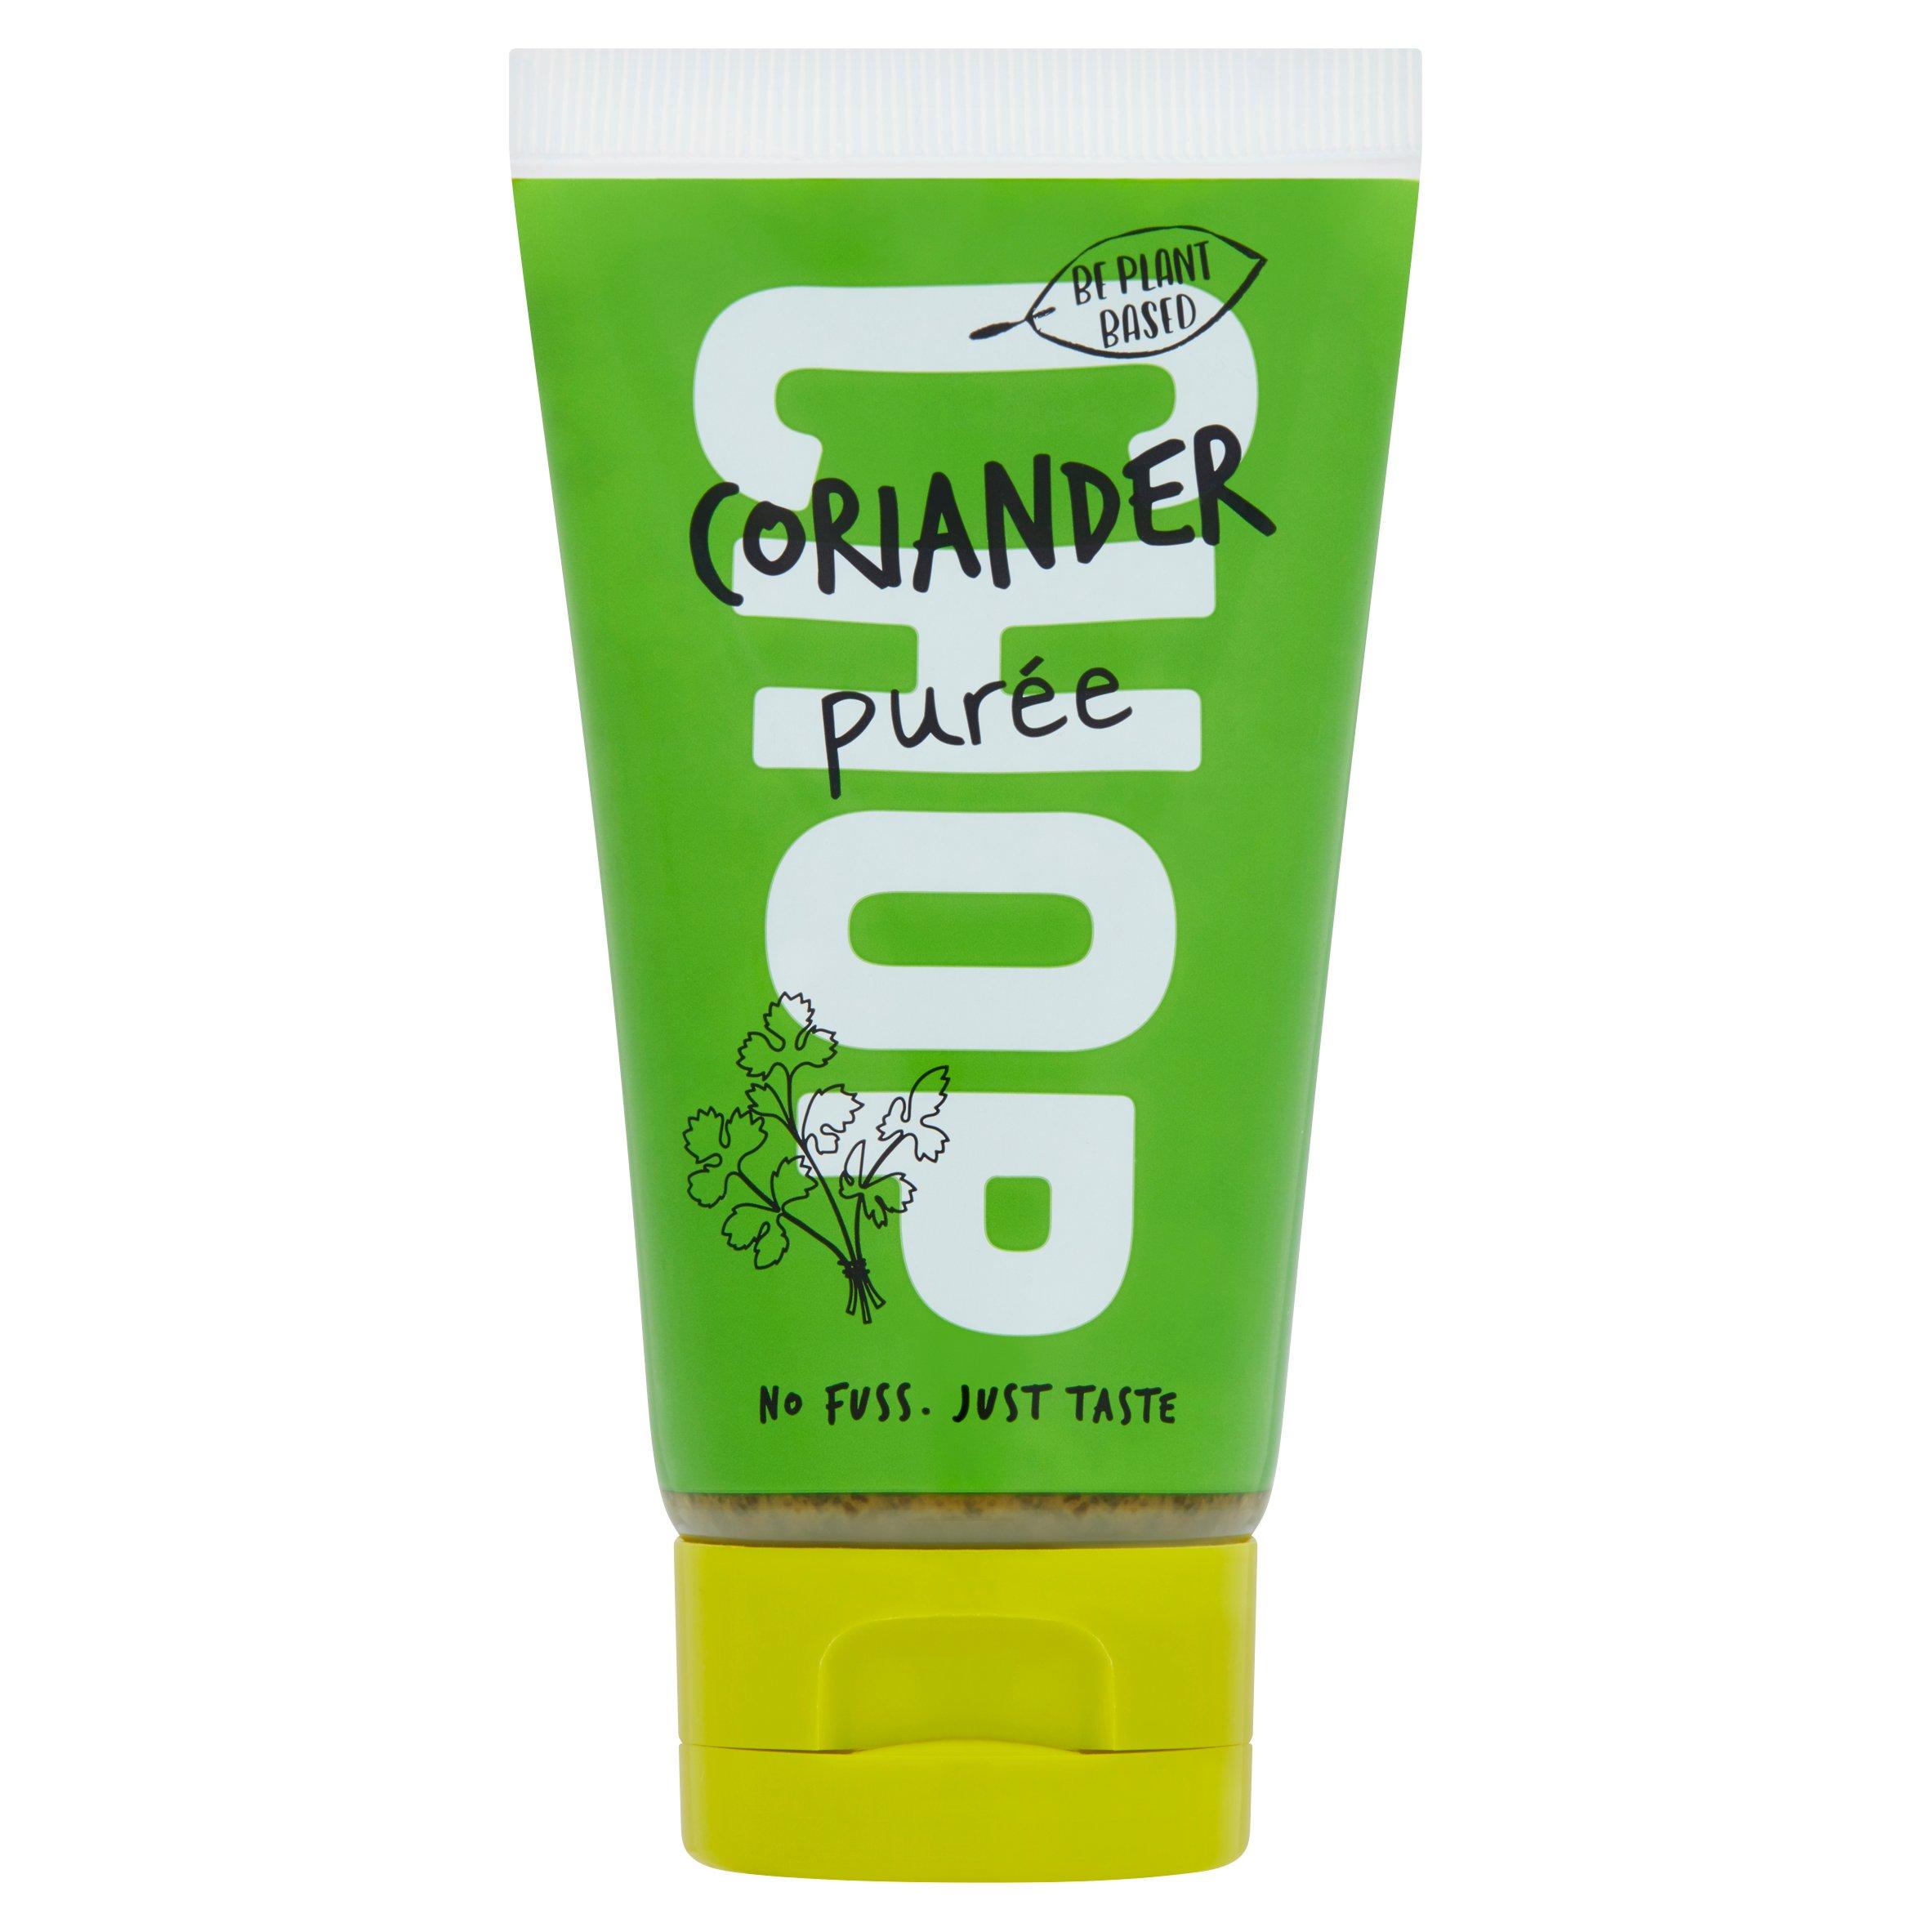 Chop Coriander Puree 75G